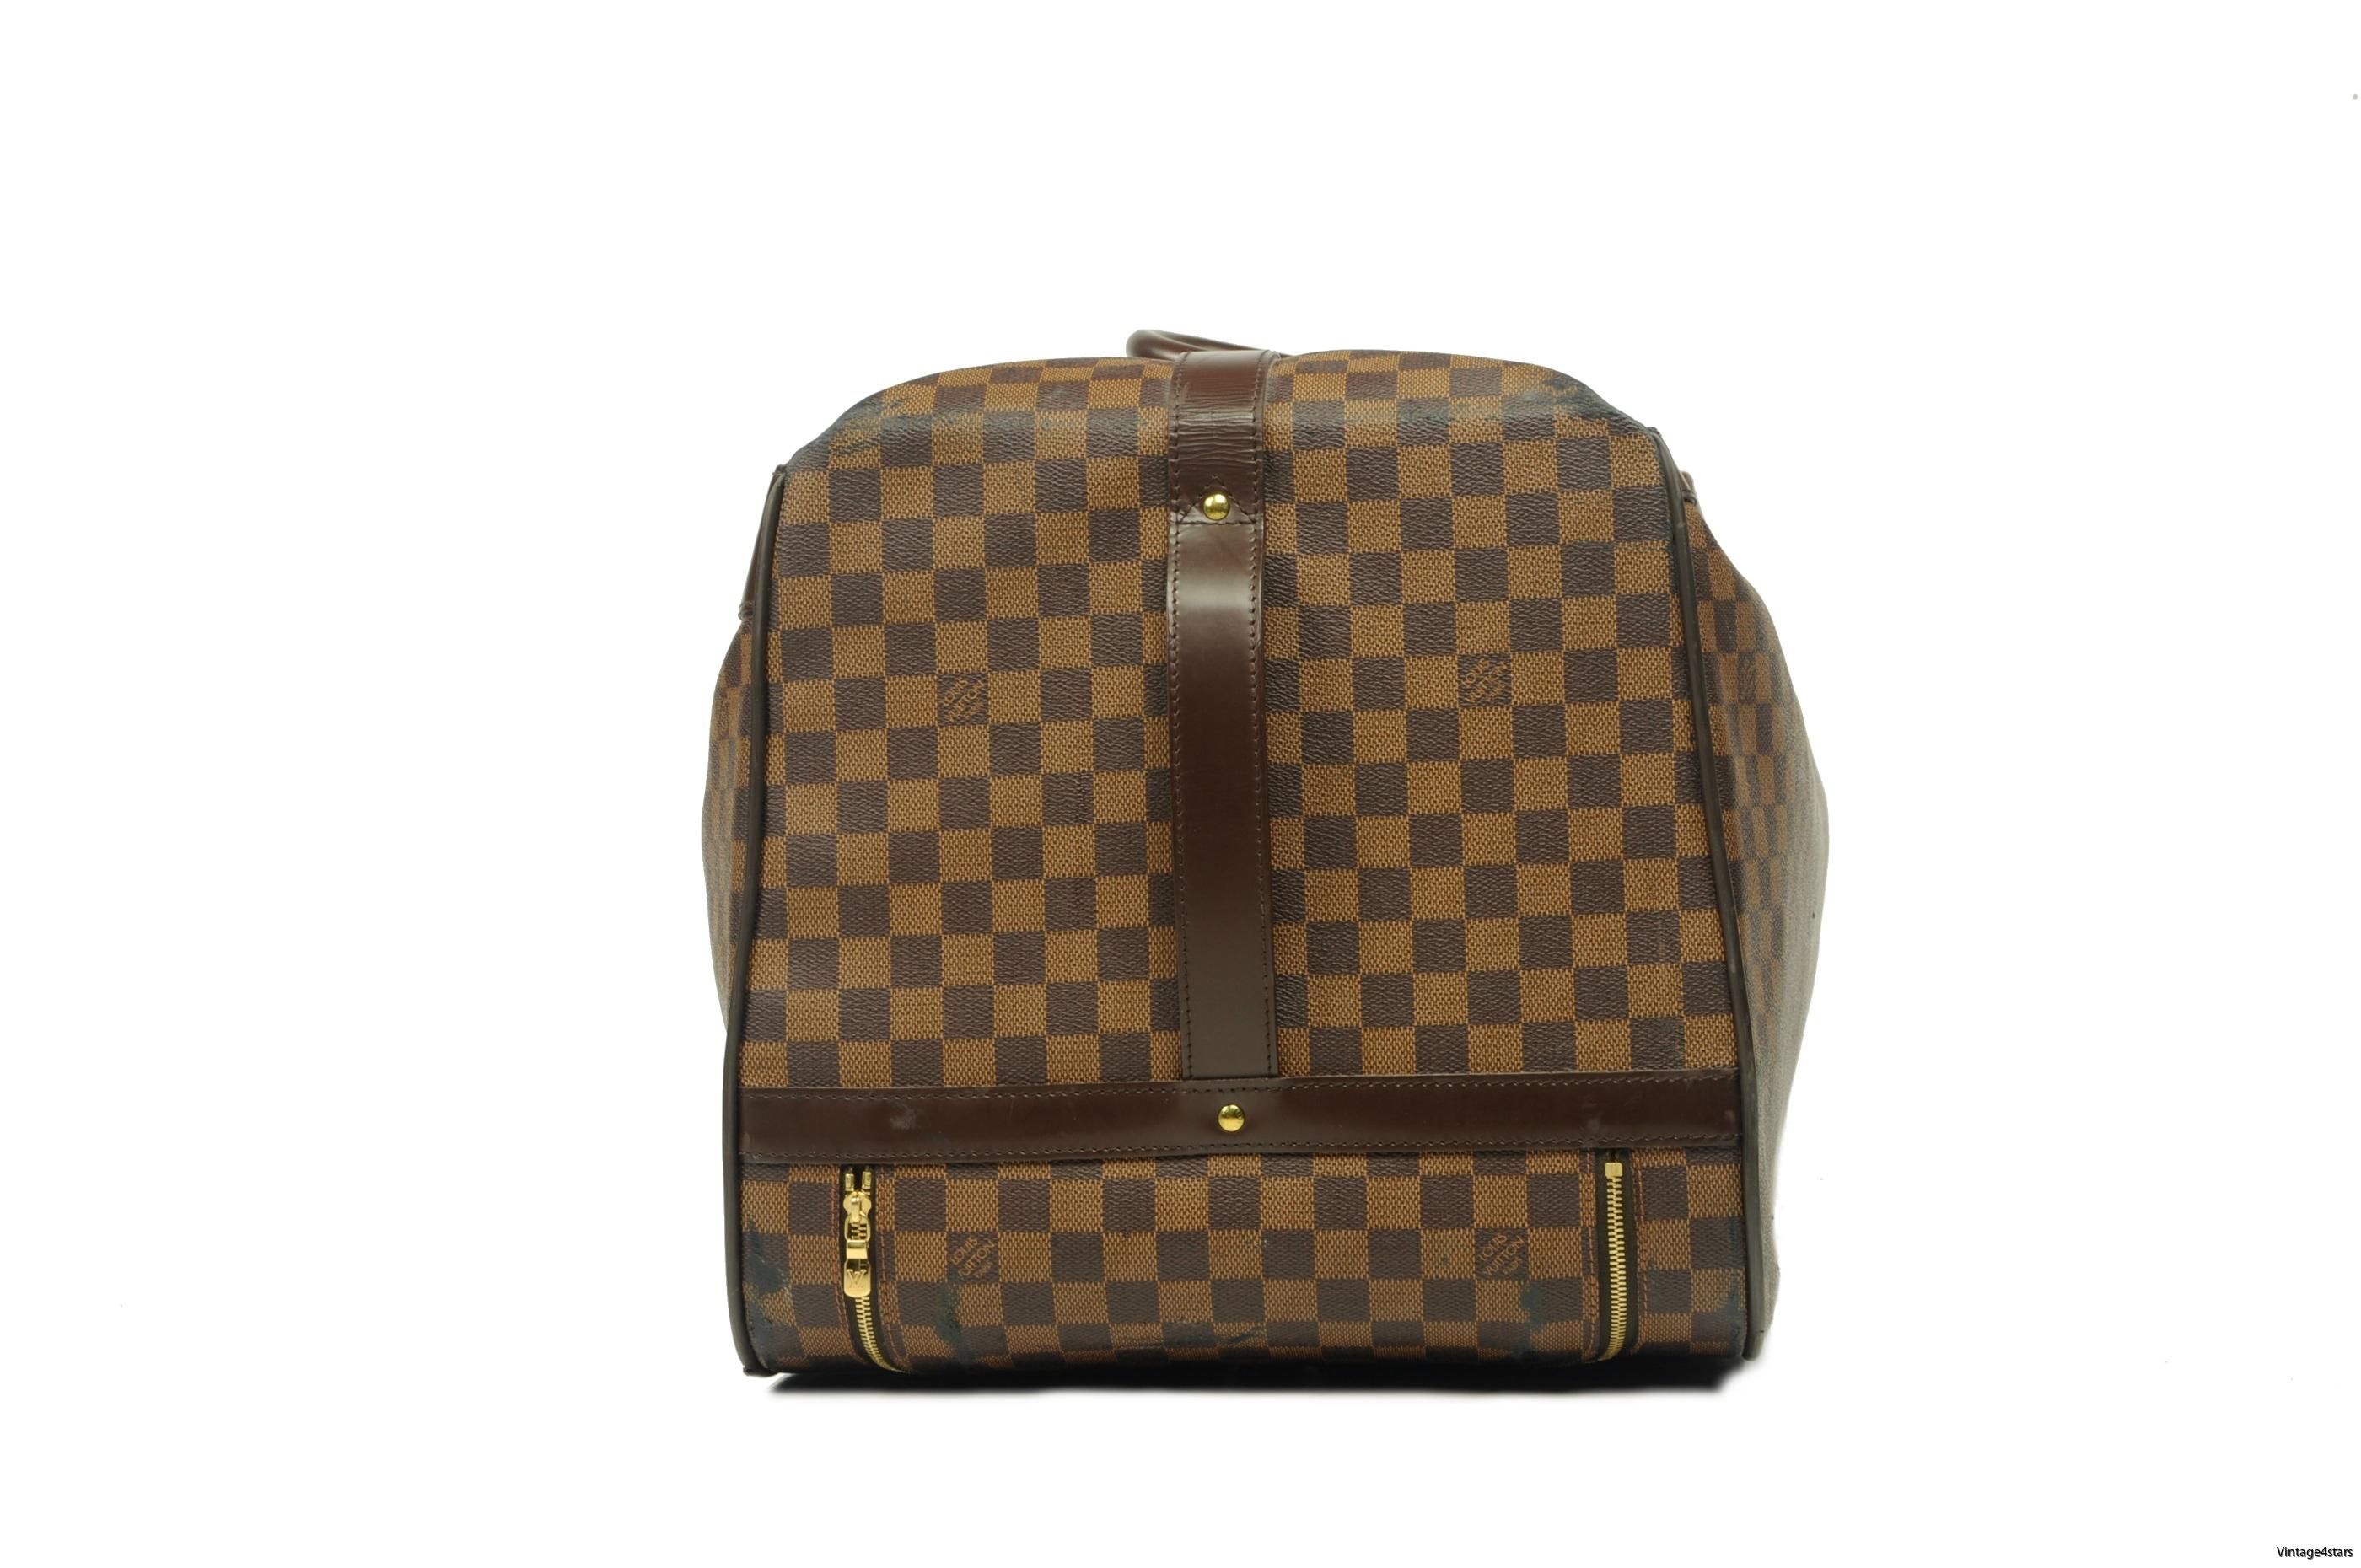 Louis Vuitton Eole 60 Damier Ebene 3